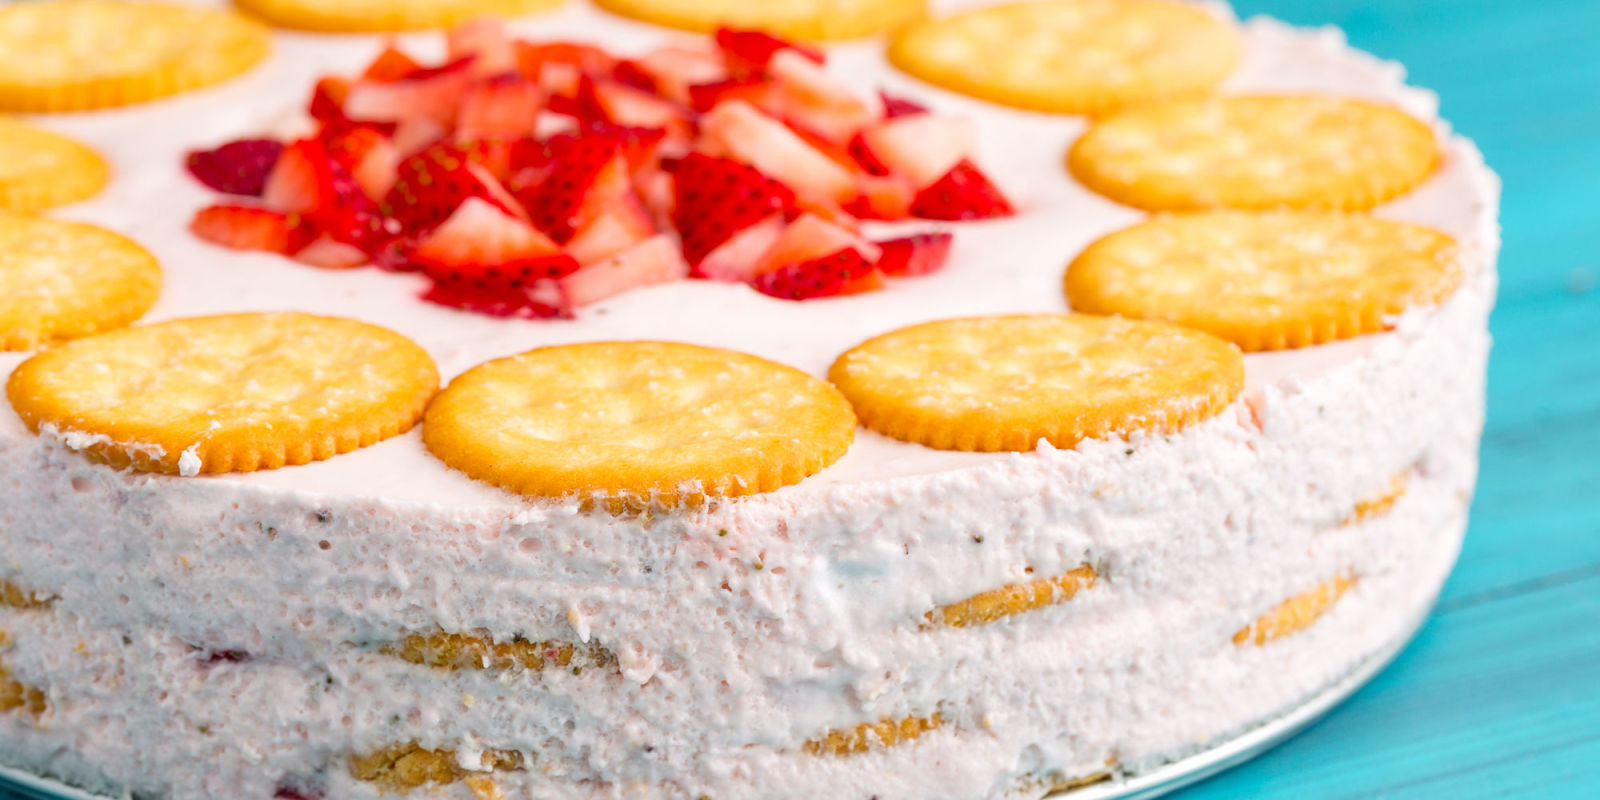 Labor Day Desserts  18 Best Labor Day Desserts Recipes for Labor Day Dessert